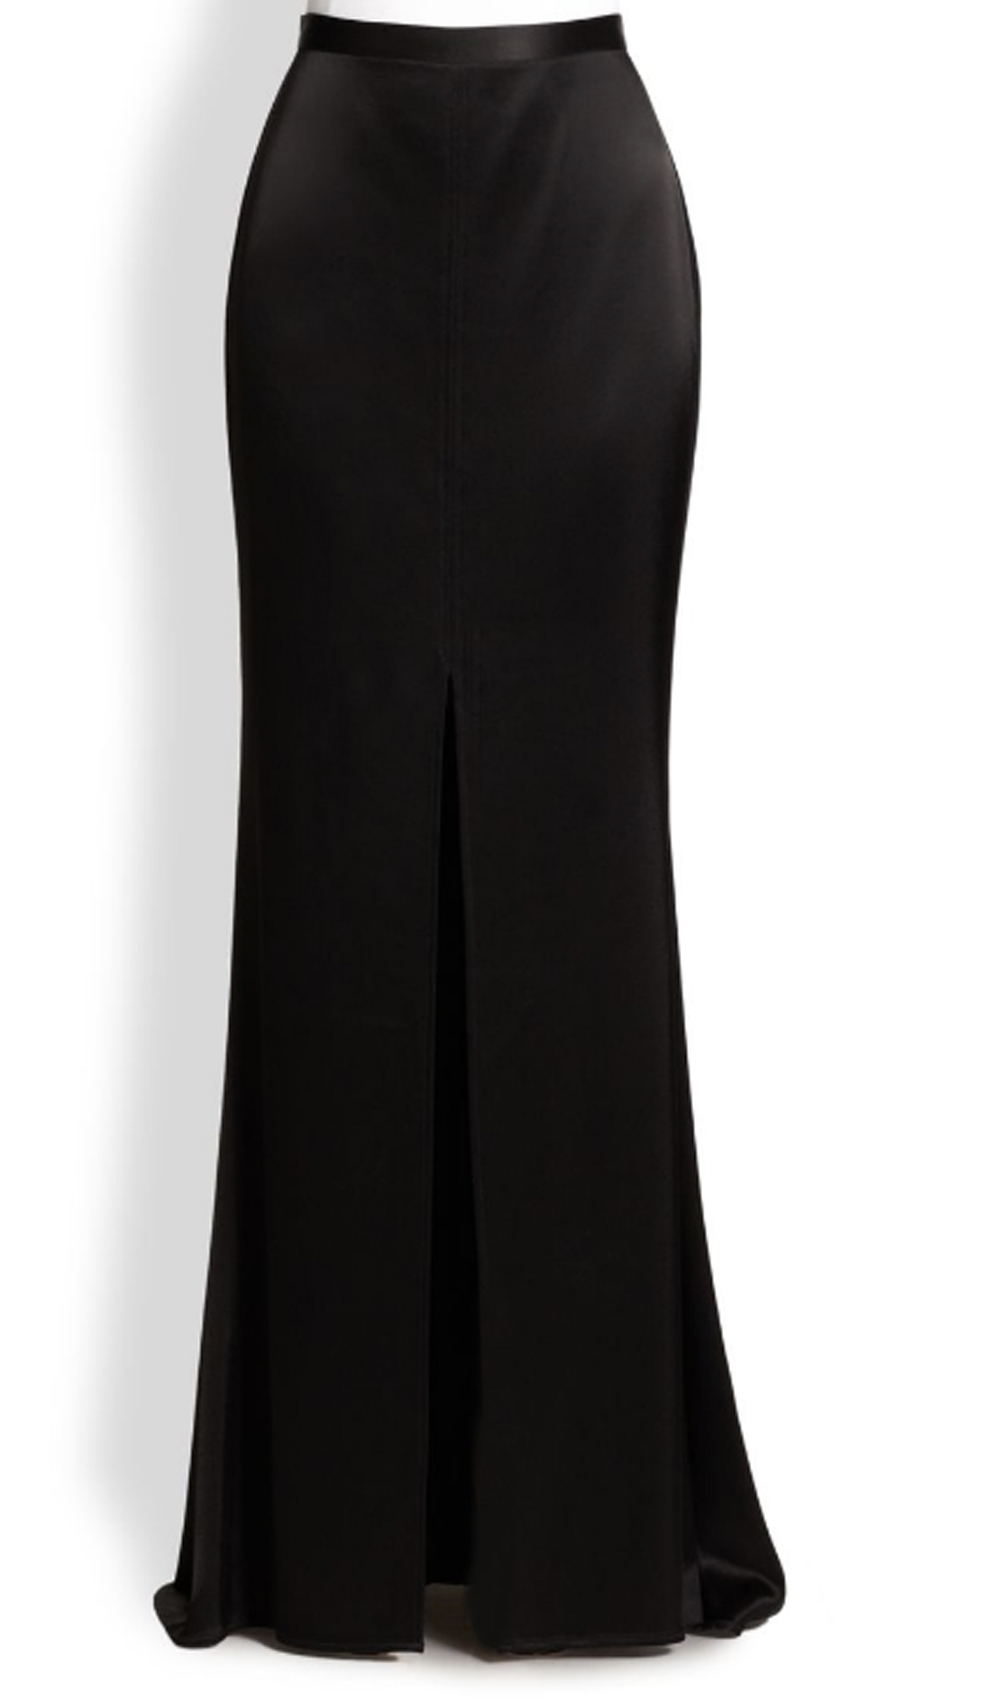 Black Satin Maxi Skirt With Open Front Split Elizabeth S